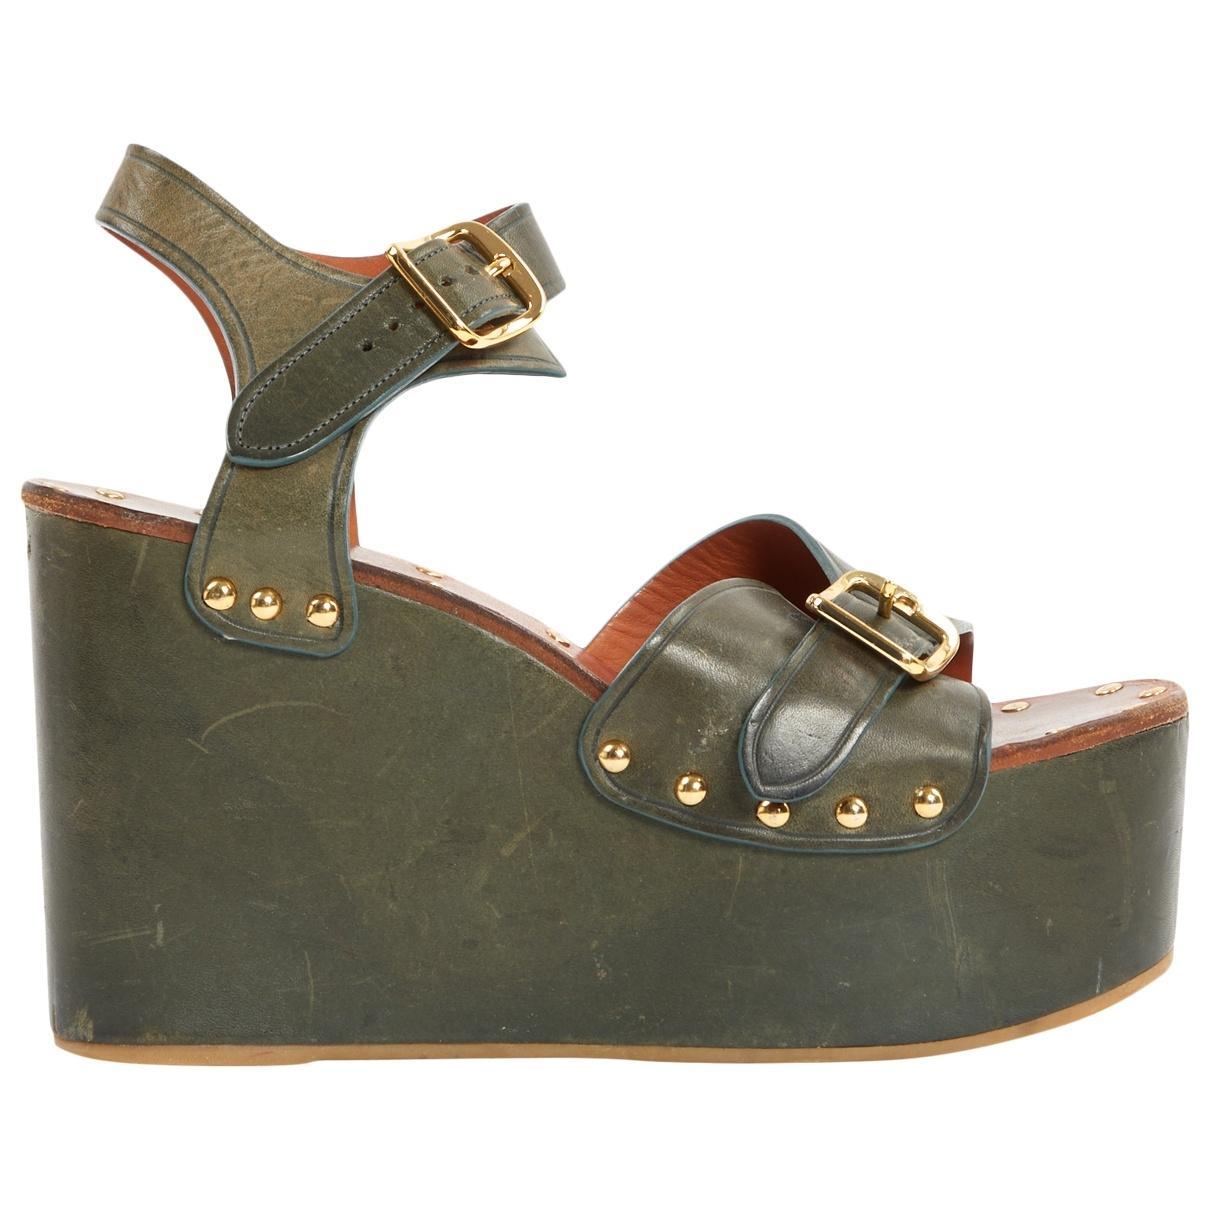 d55e3fa2d Céline. Women s Green Leather Sandals.  392 From Vestiaire Collective